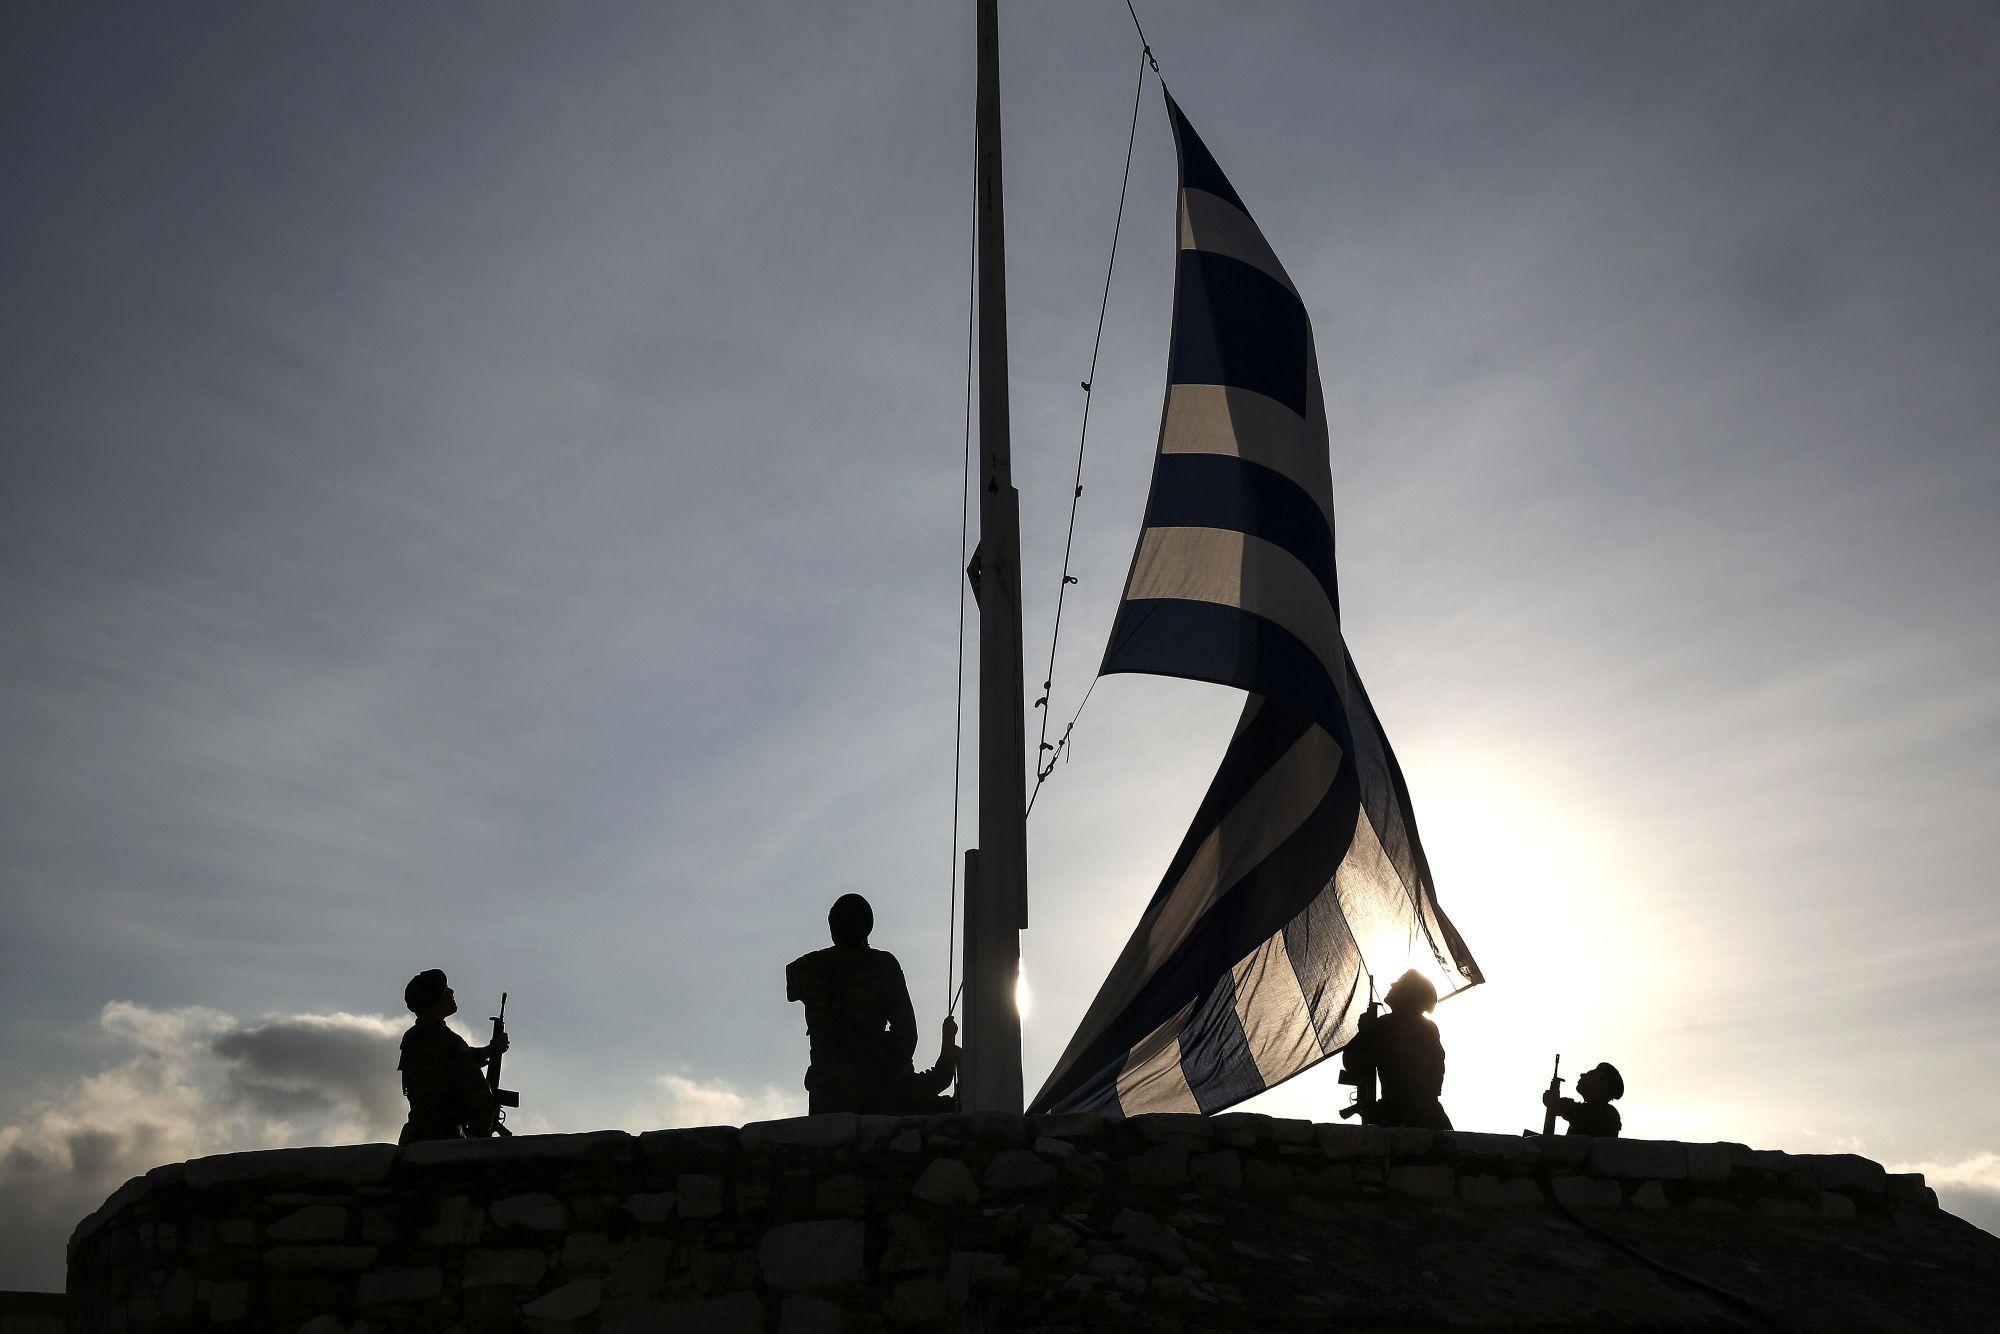 Turkey Slams Greece for 'Illegally' Arming 16 Aegean Islands